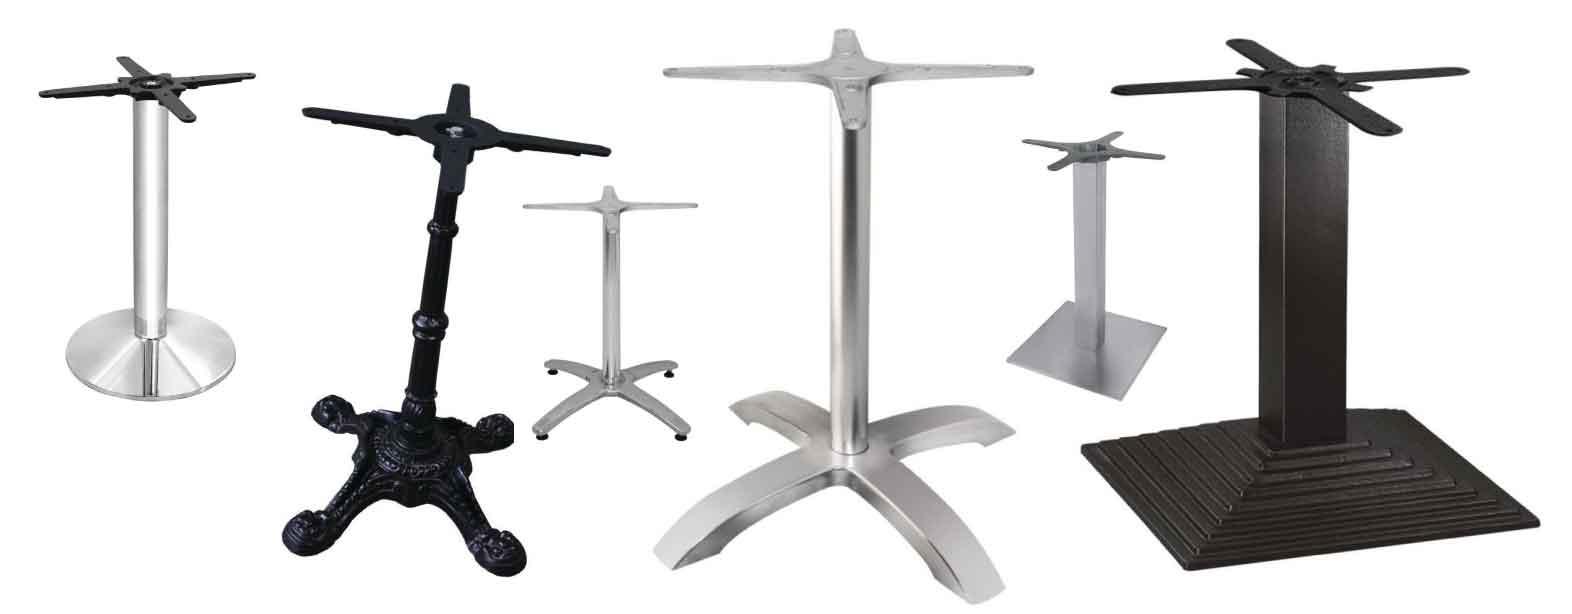 Pieds de tables